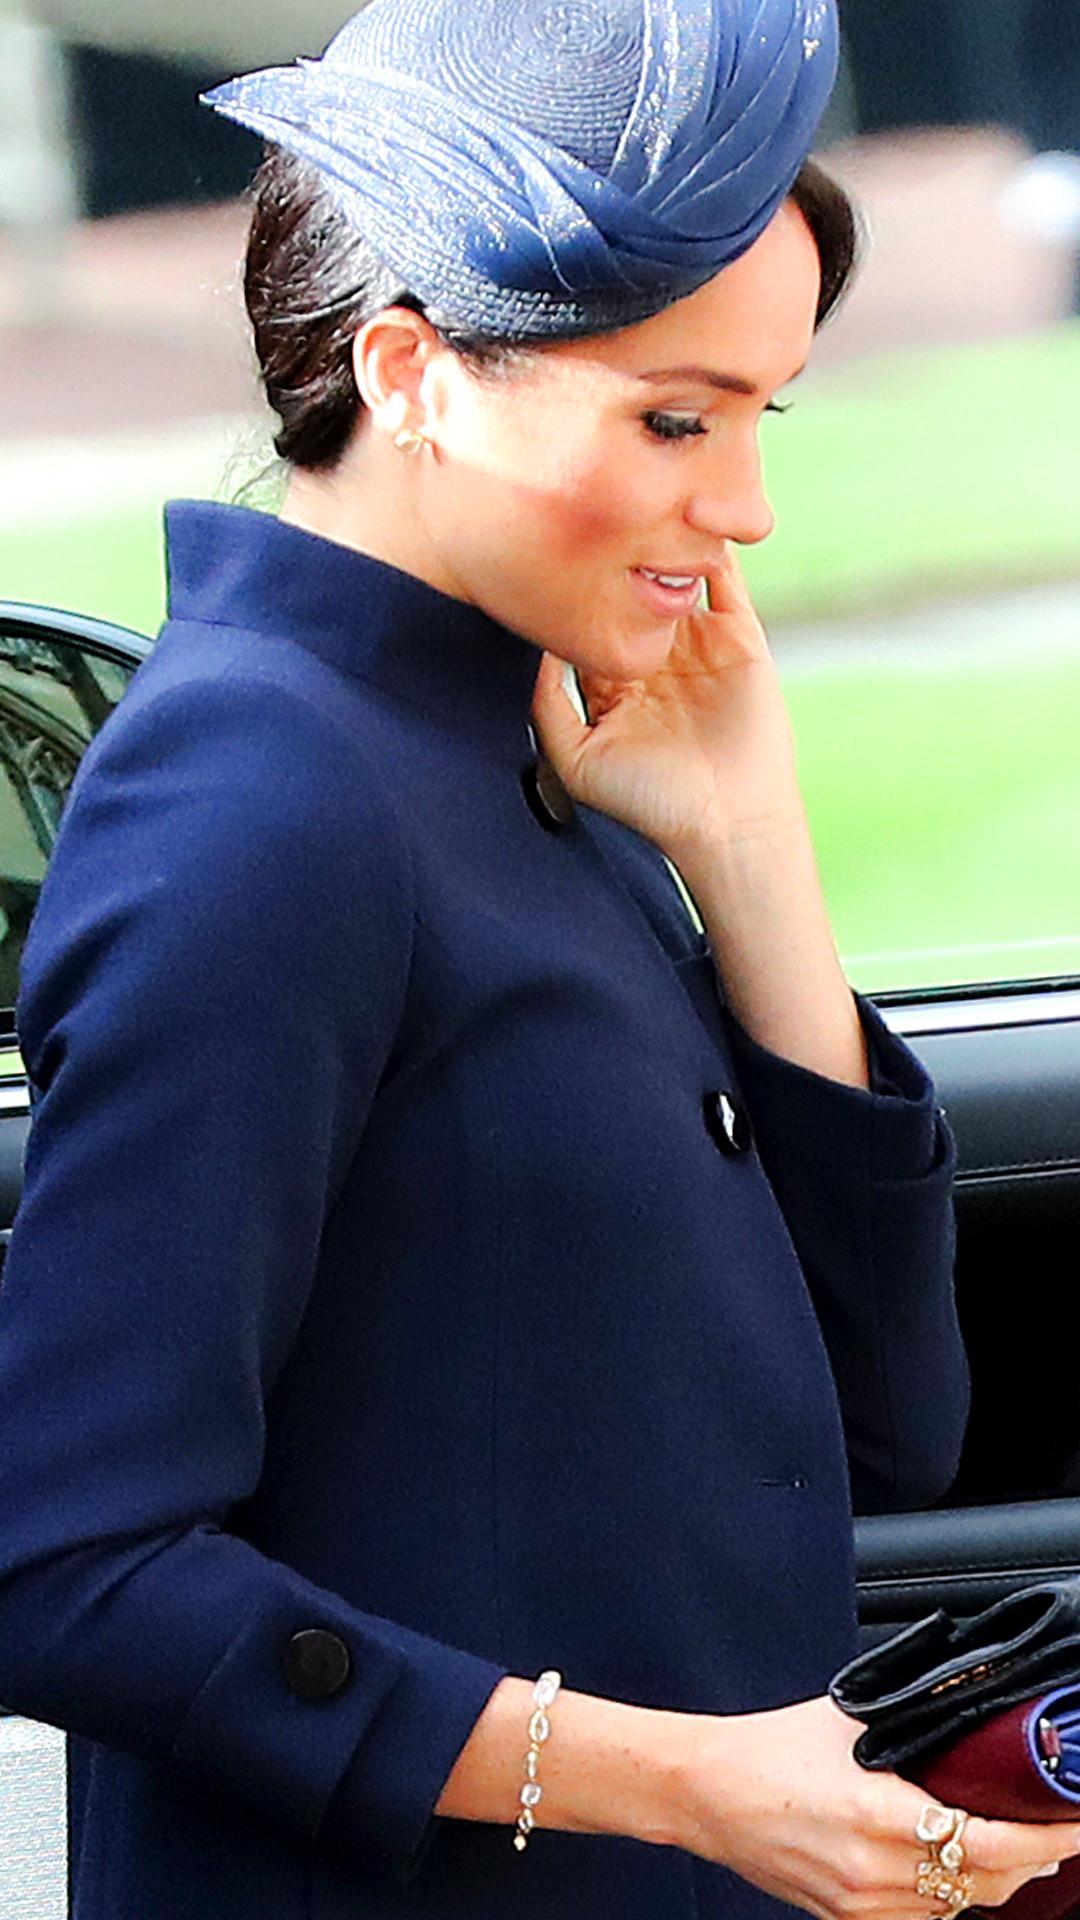 ESC: Meghan Markle, Duchess of Sussex, Princess Eugenie Royal Wedding